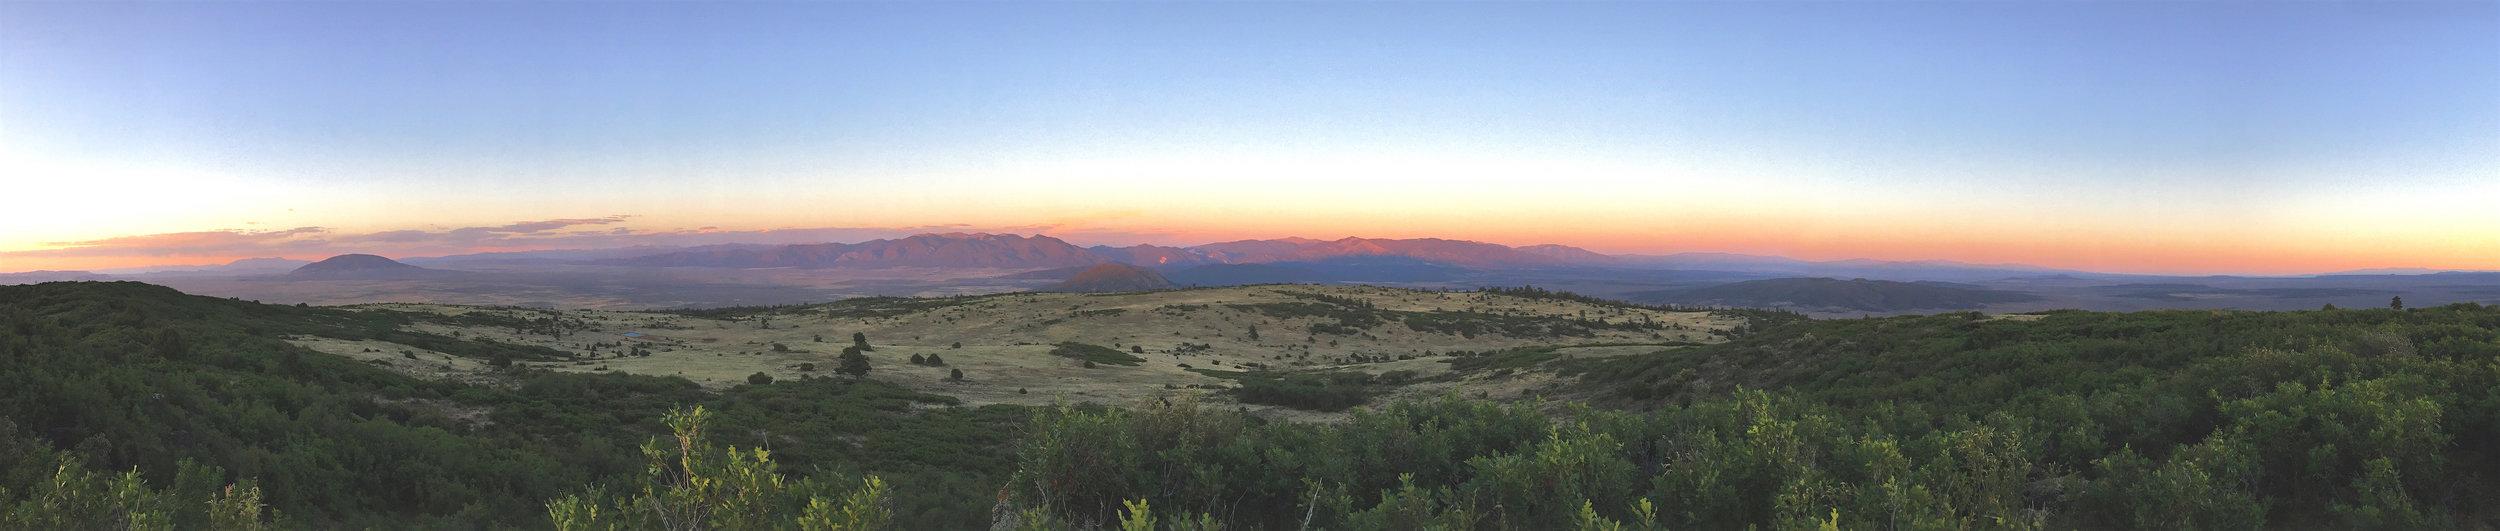 Sunset+Landscape+Panorama+-+Pot+Mtn.jpg